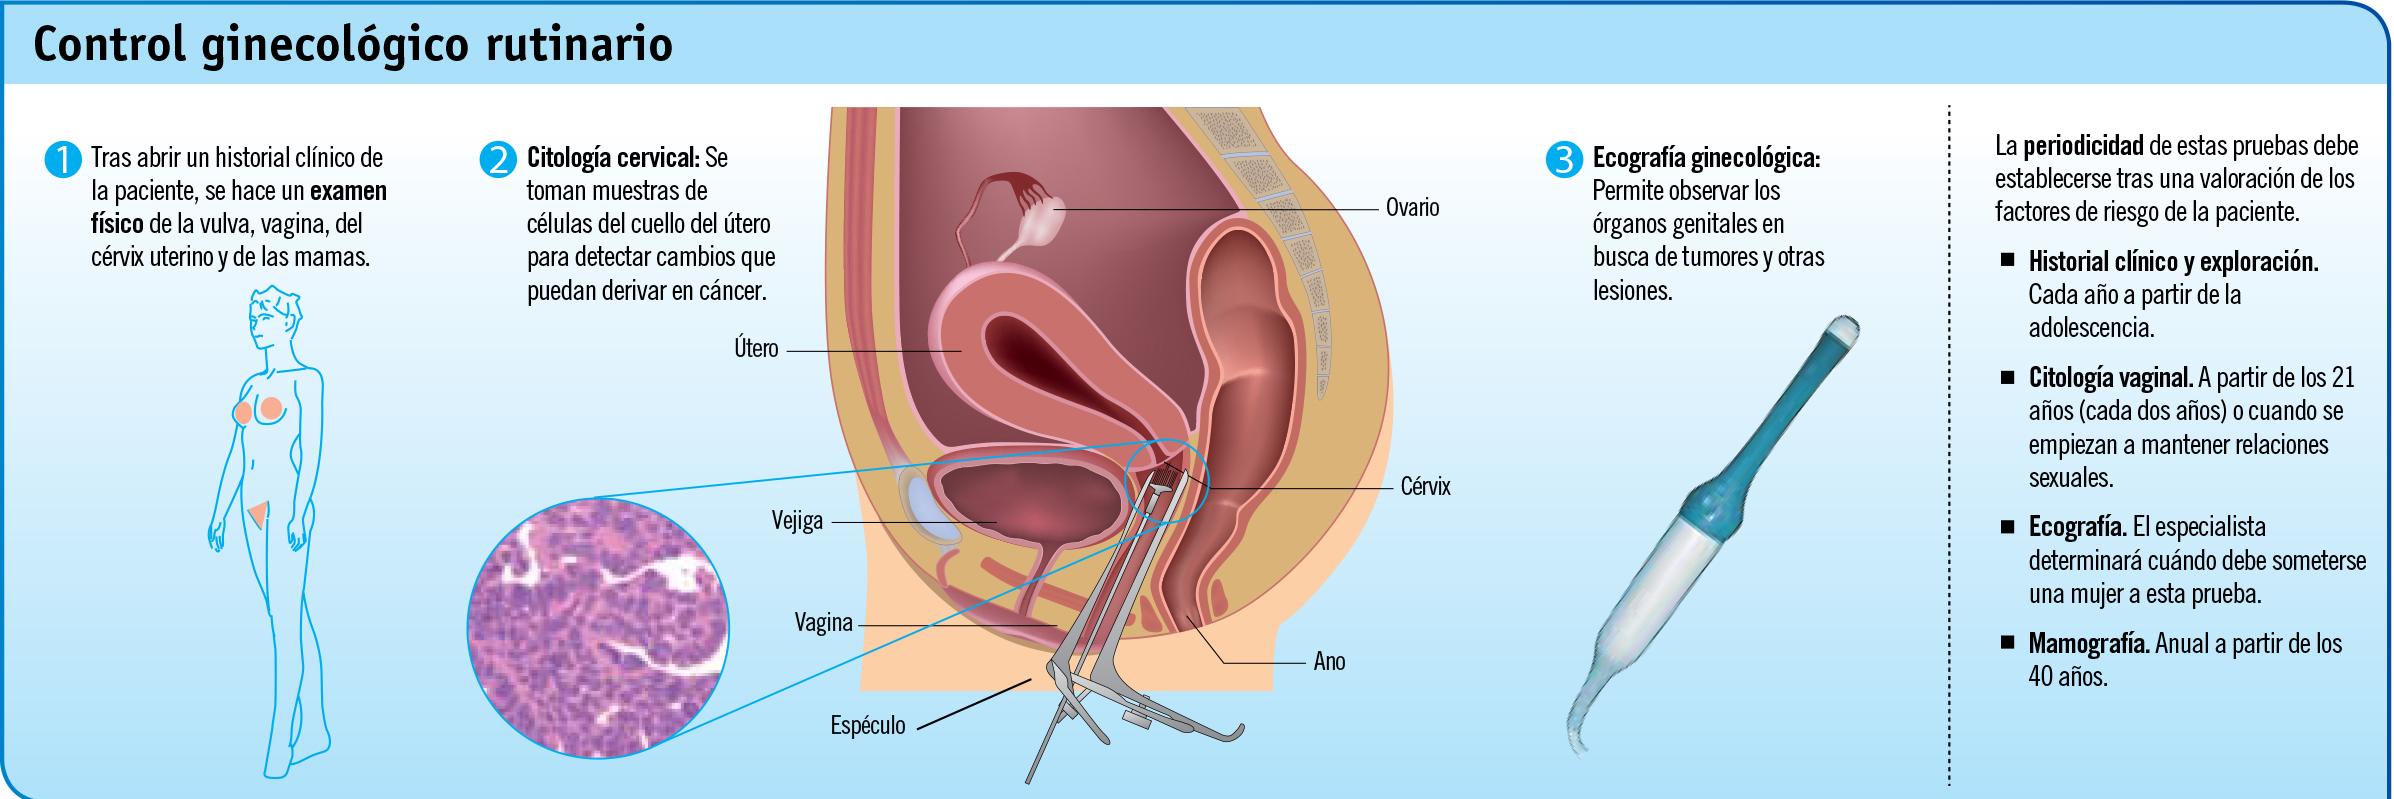 El control ginecológico a examen